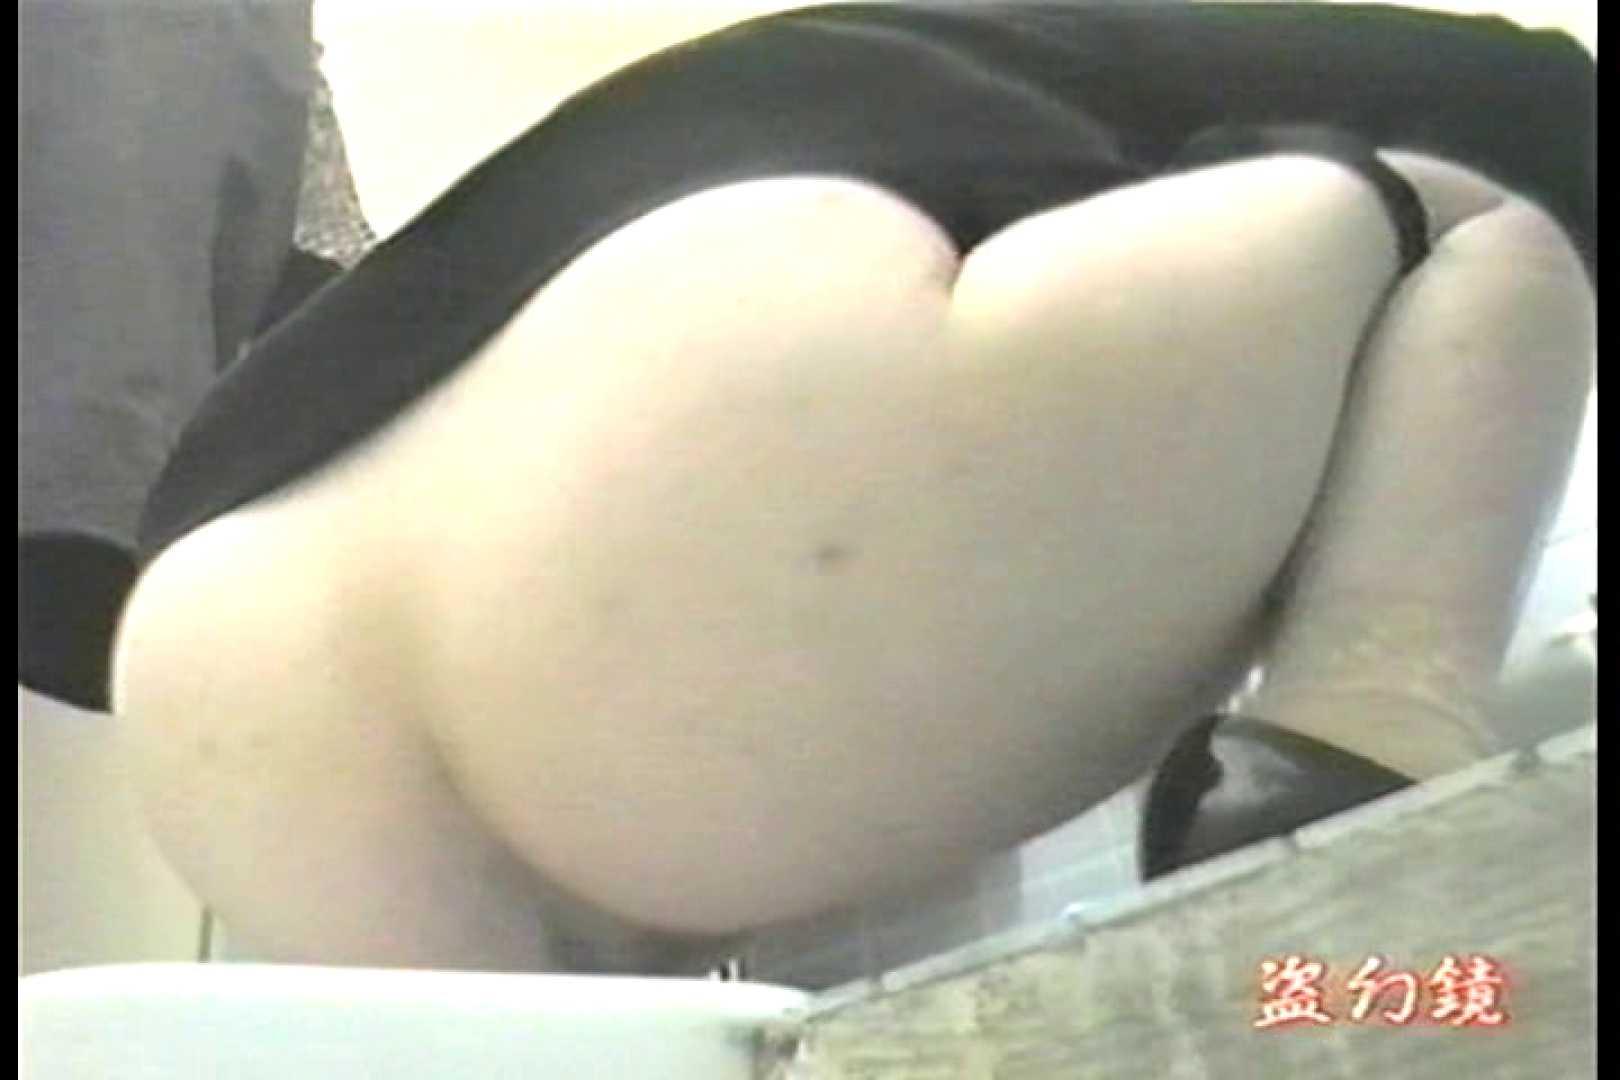 洗面所羞恥美女んMV-2 美女エロ画像  46PICs 10